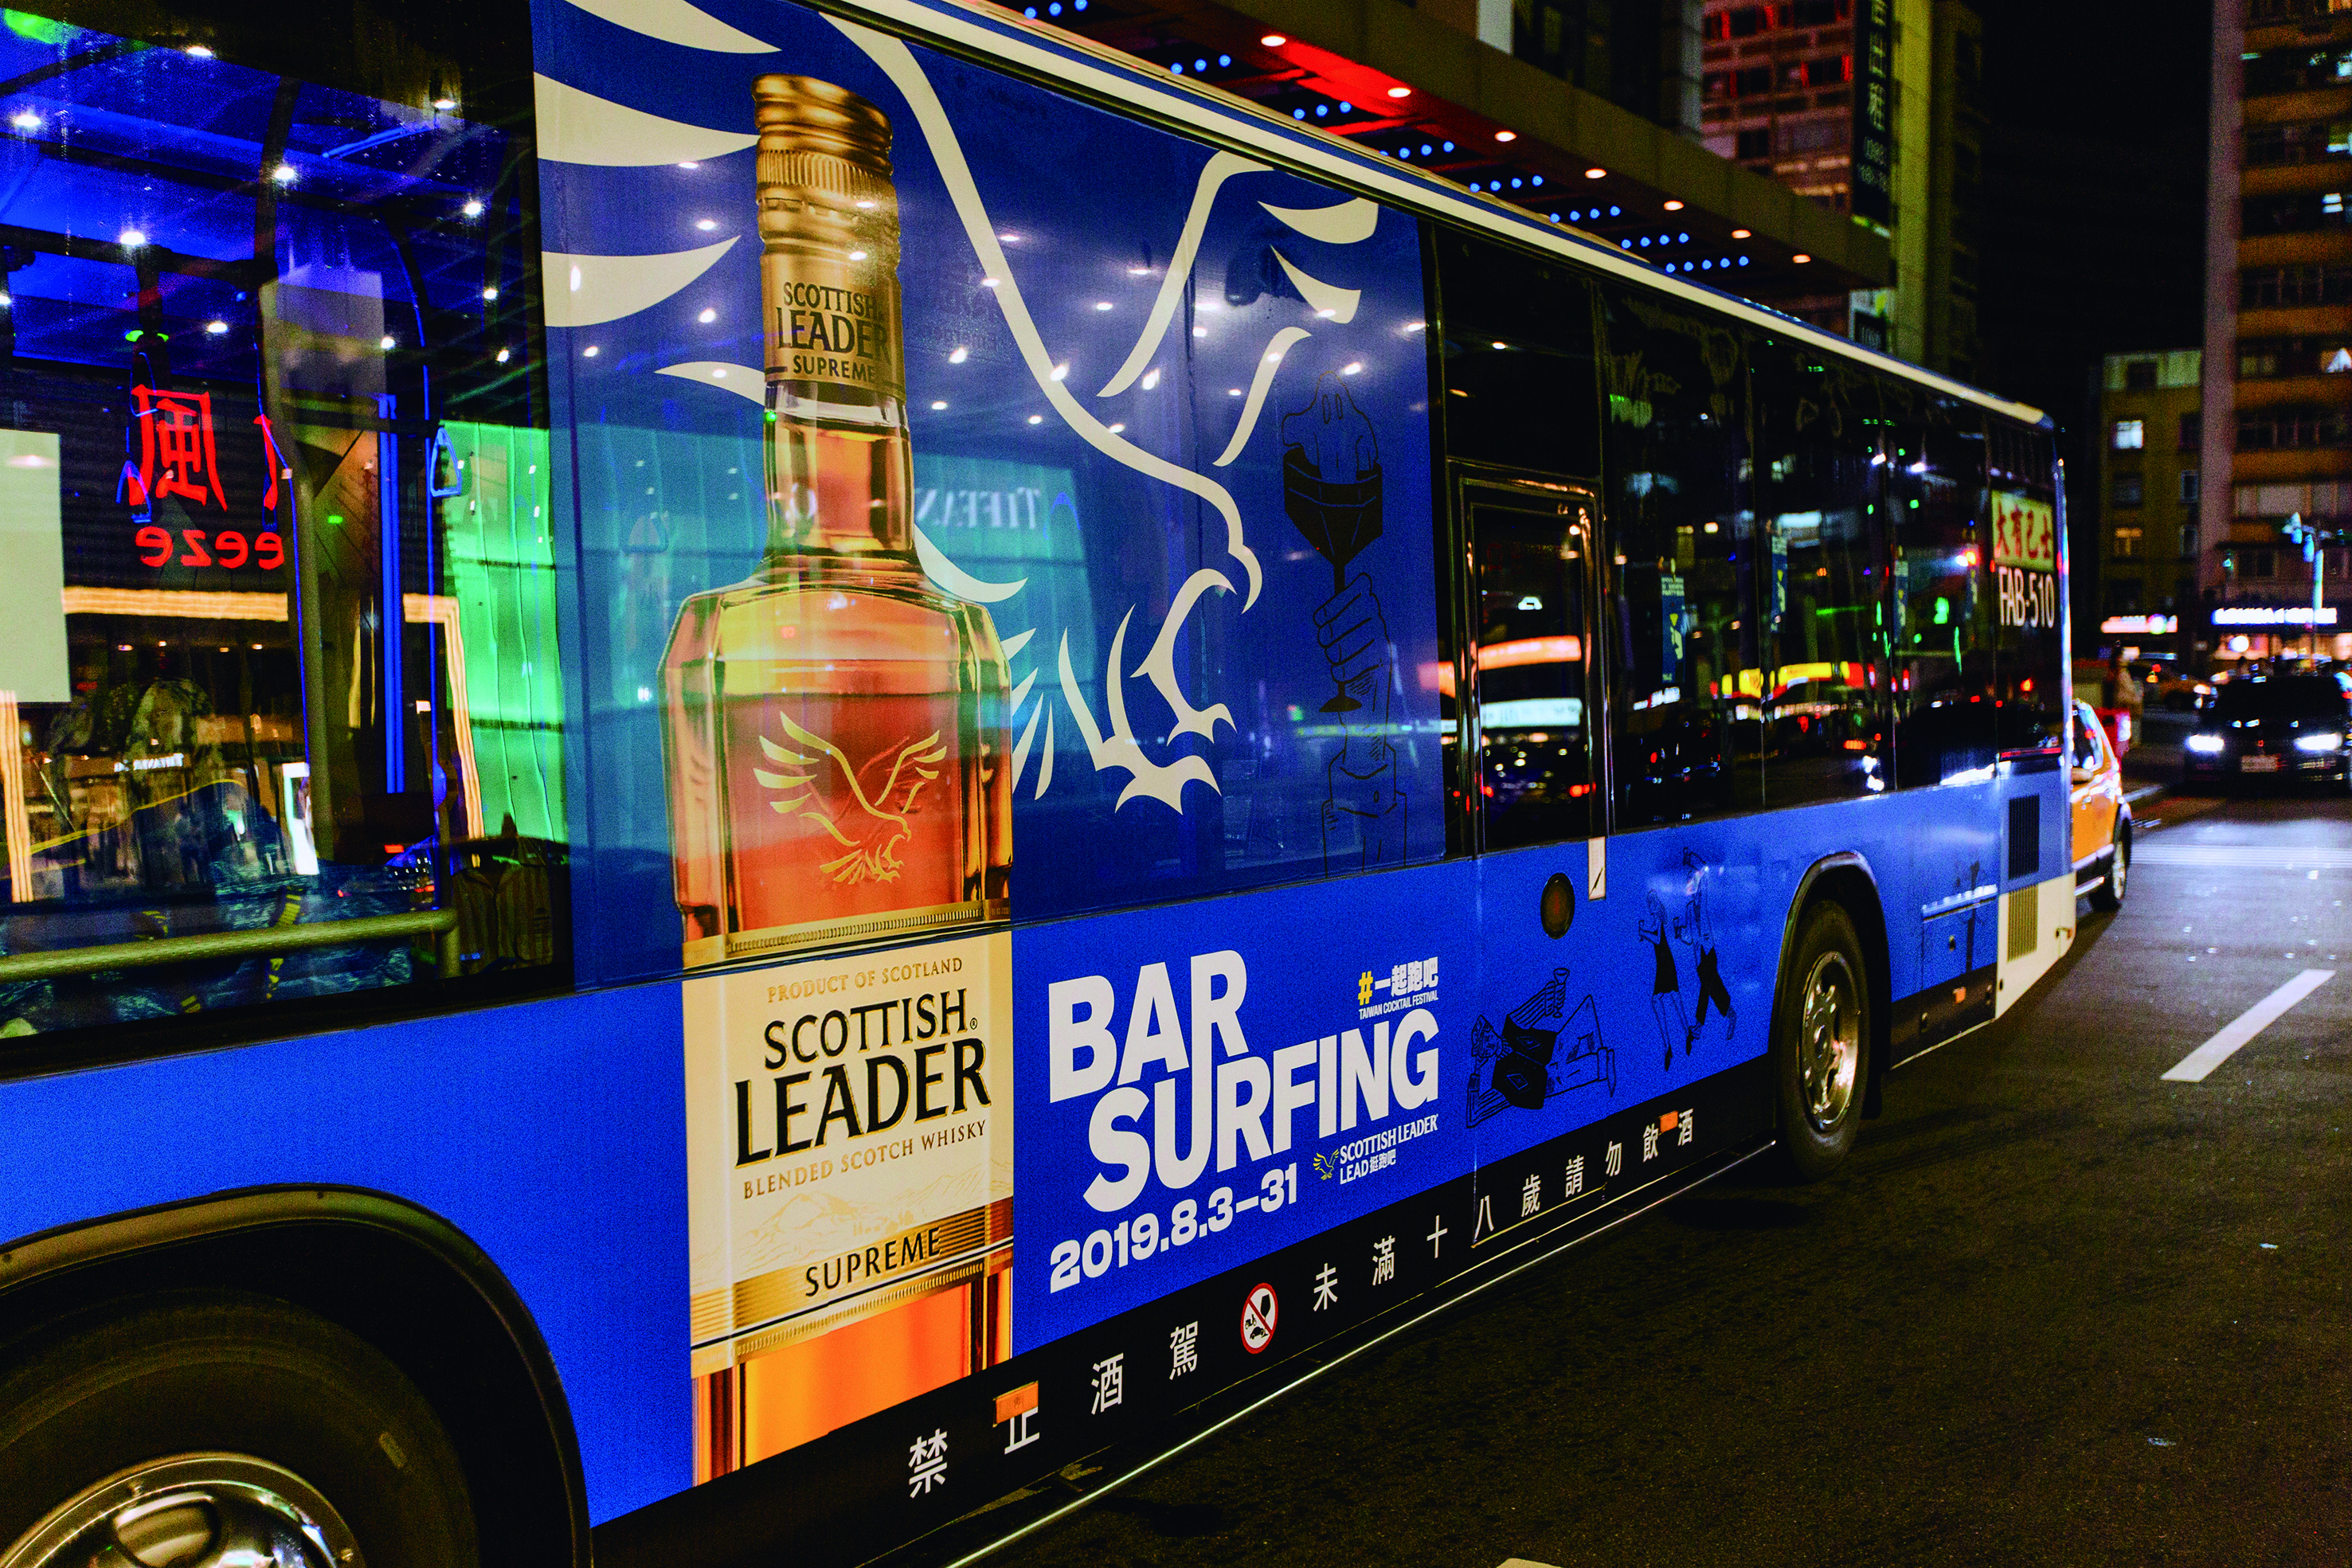 Party bus close up - giles.heasman(何家樂) - Taiwan -GQ BarSurfing - Sponsor 2